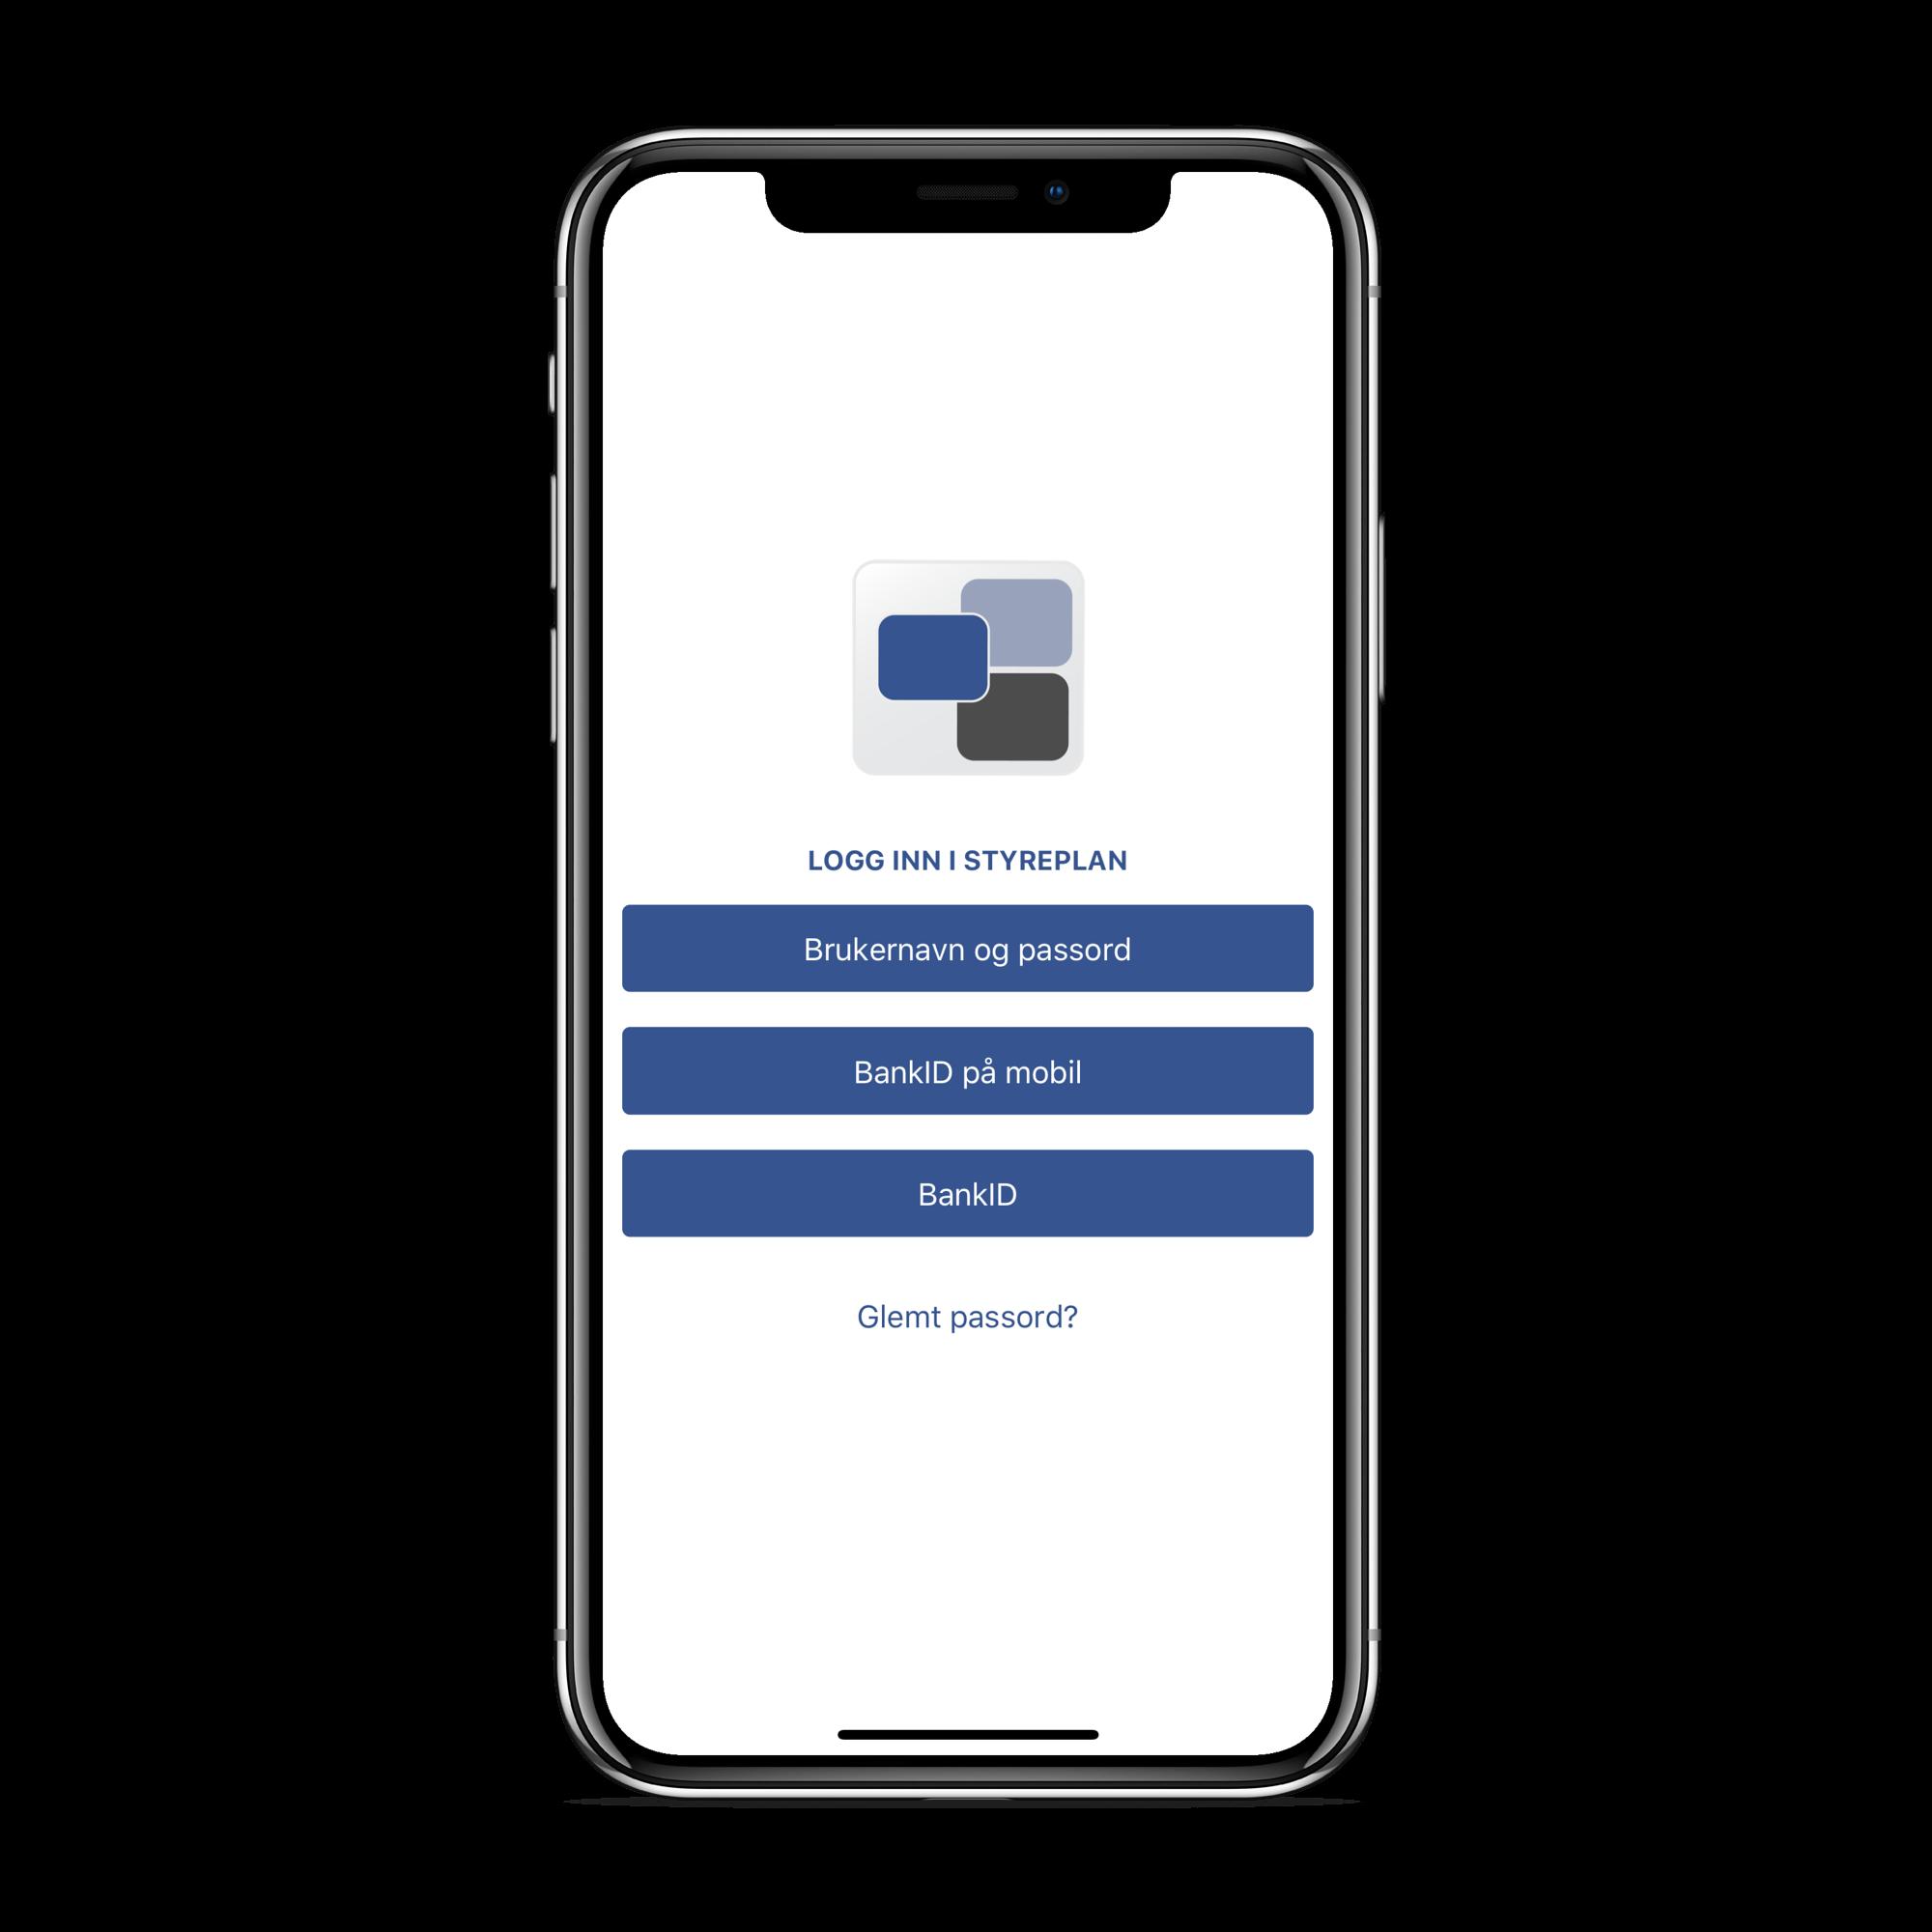 Styreplan støtter innlogging både med ordinær BankID og BankID på mobil